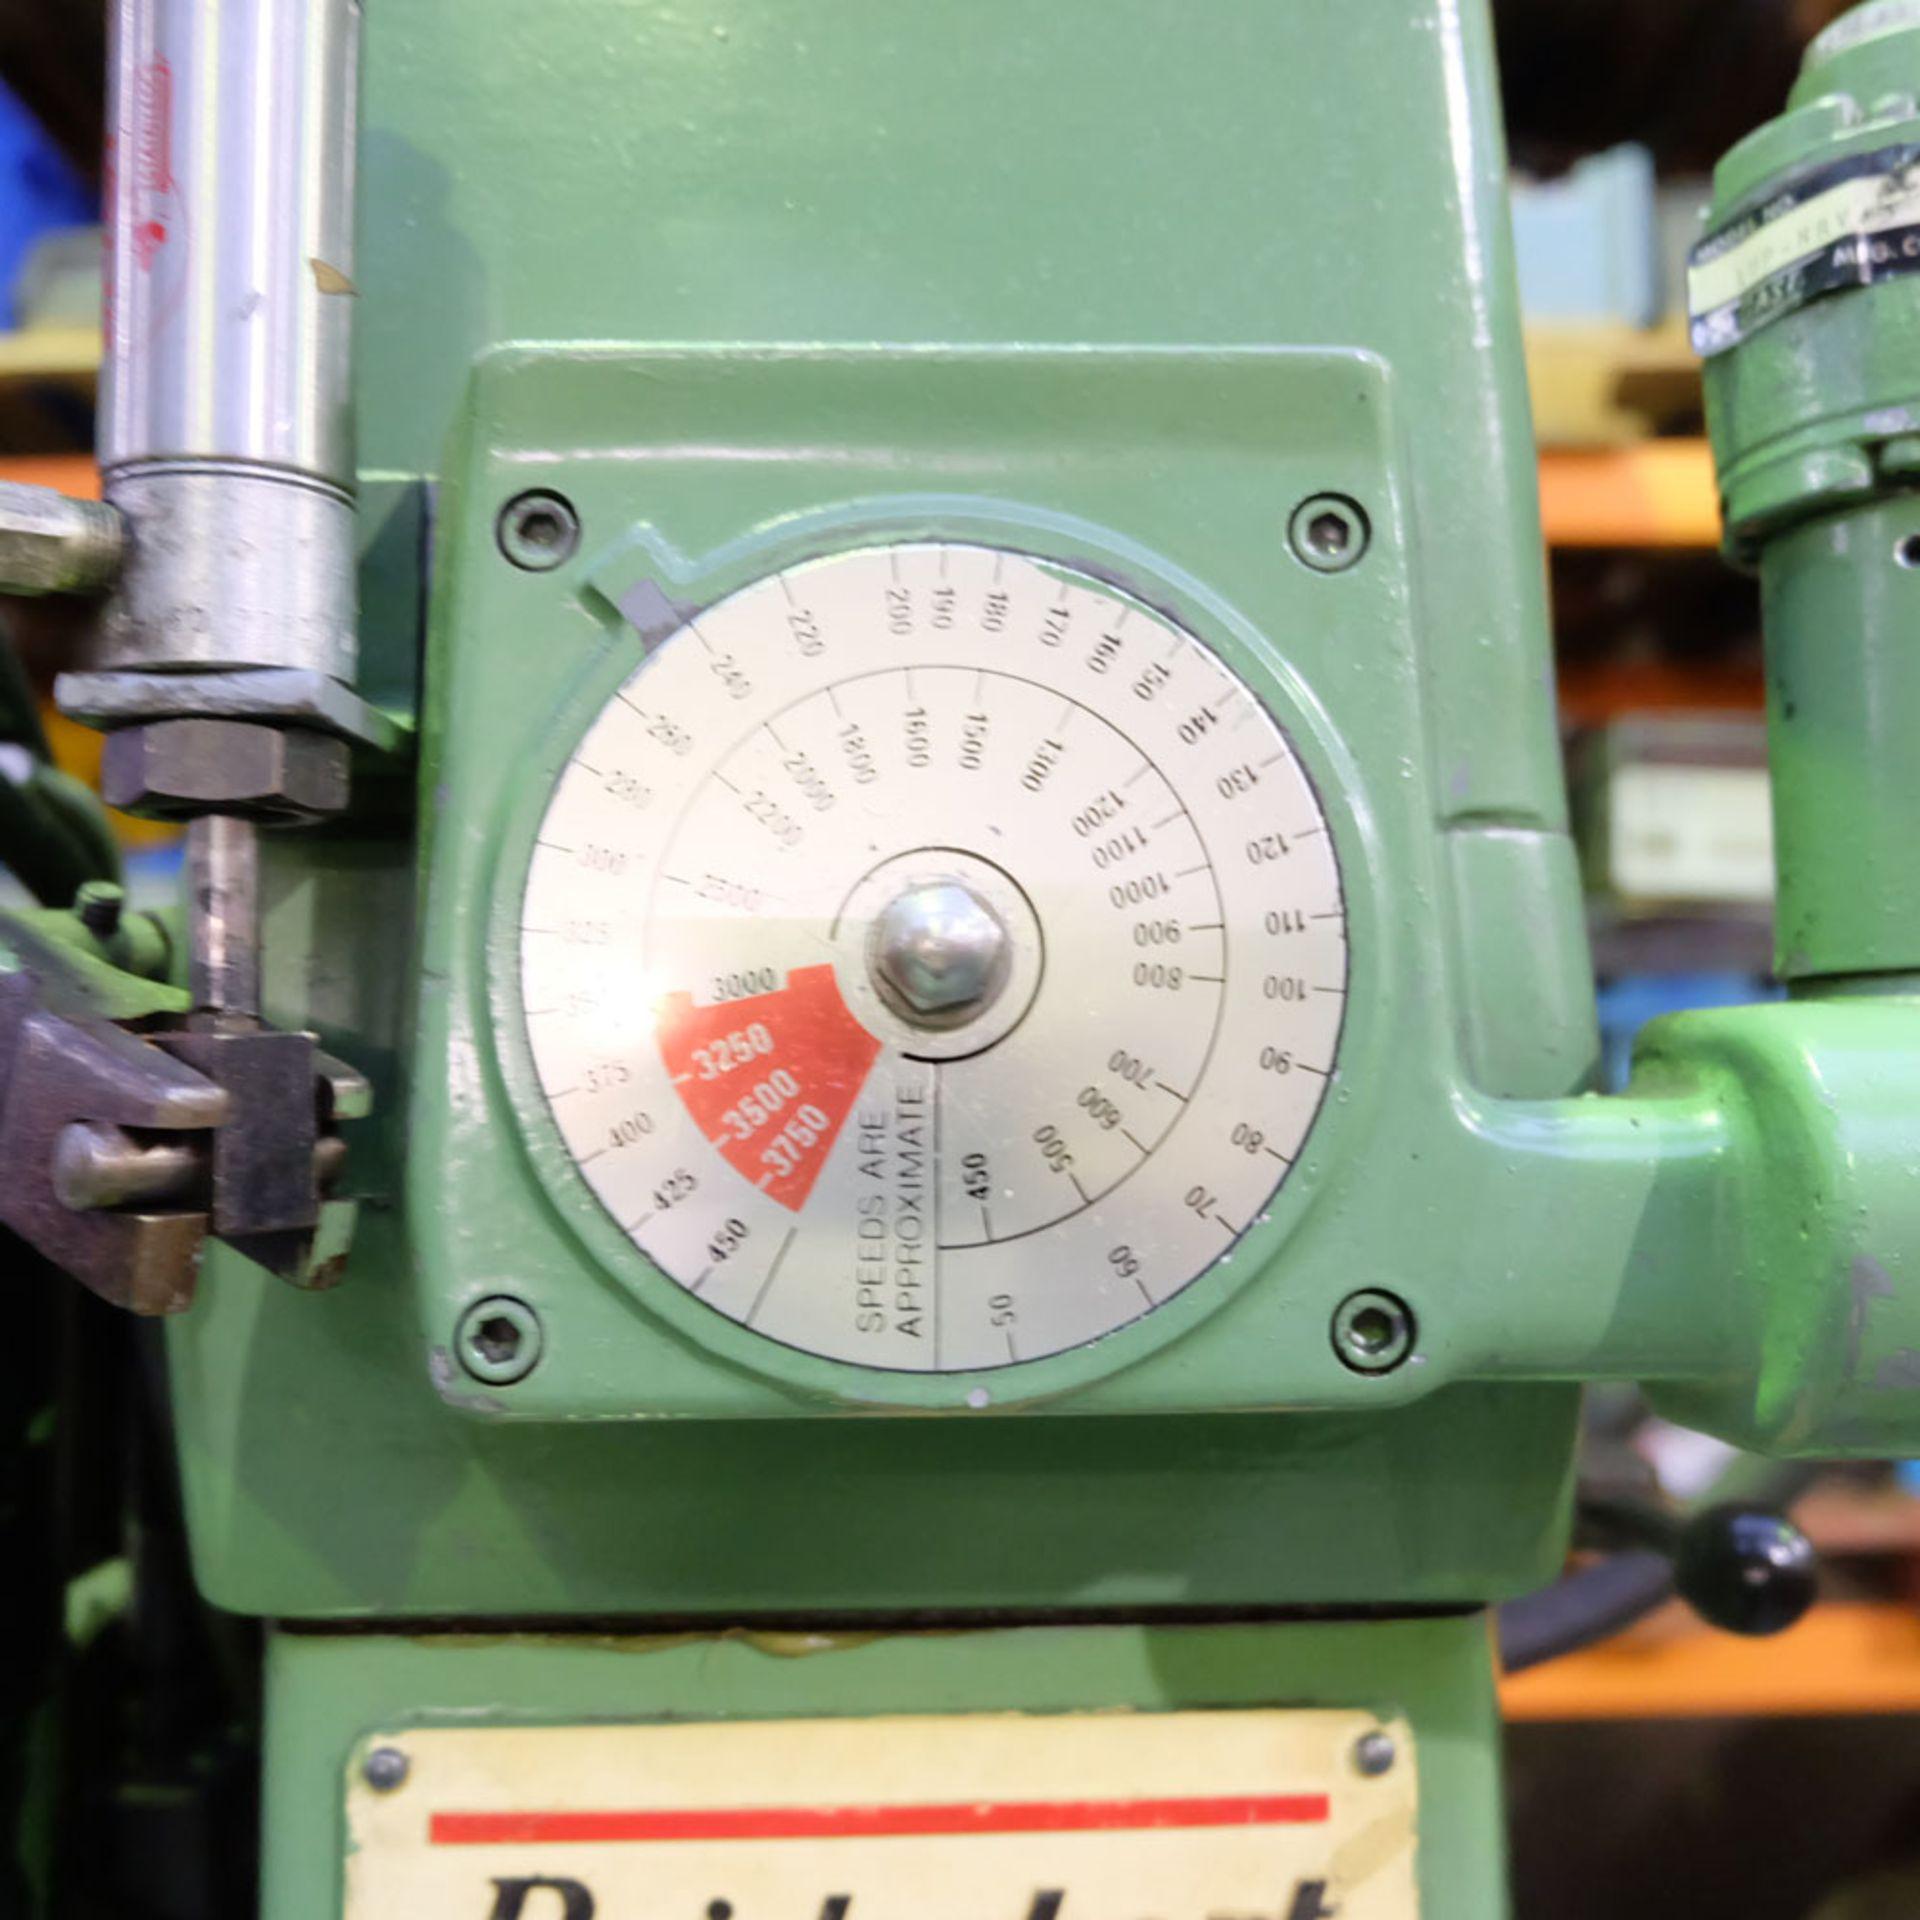 Bridgeport Series 1 MDI. CNC Mill with Heidenhain TNC131 3 Axis Control. - Image 10 of 14